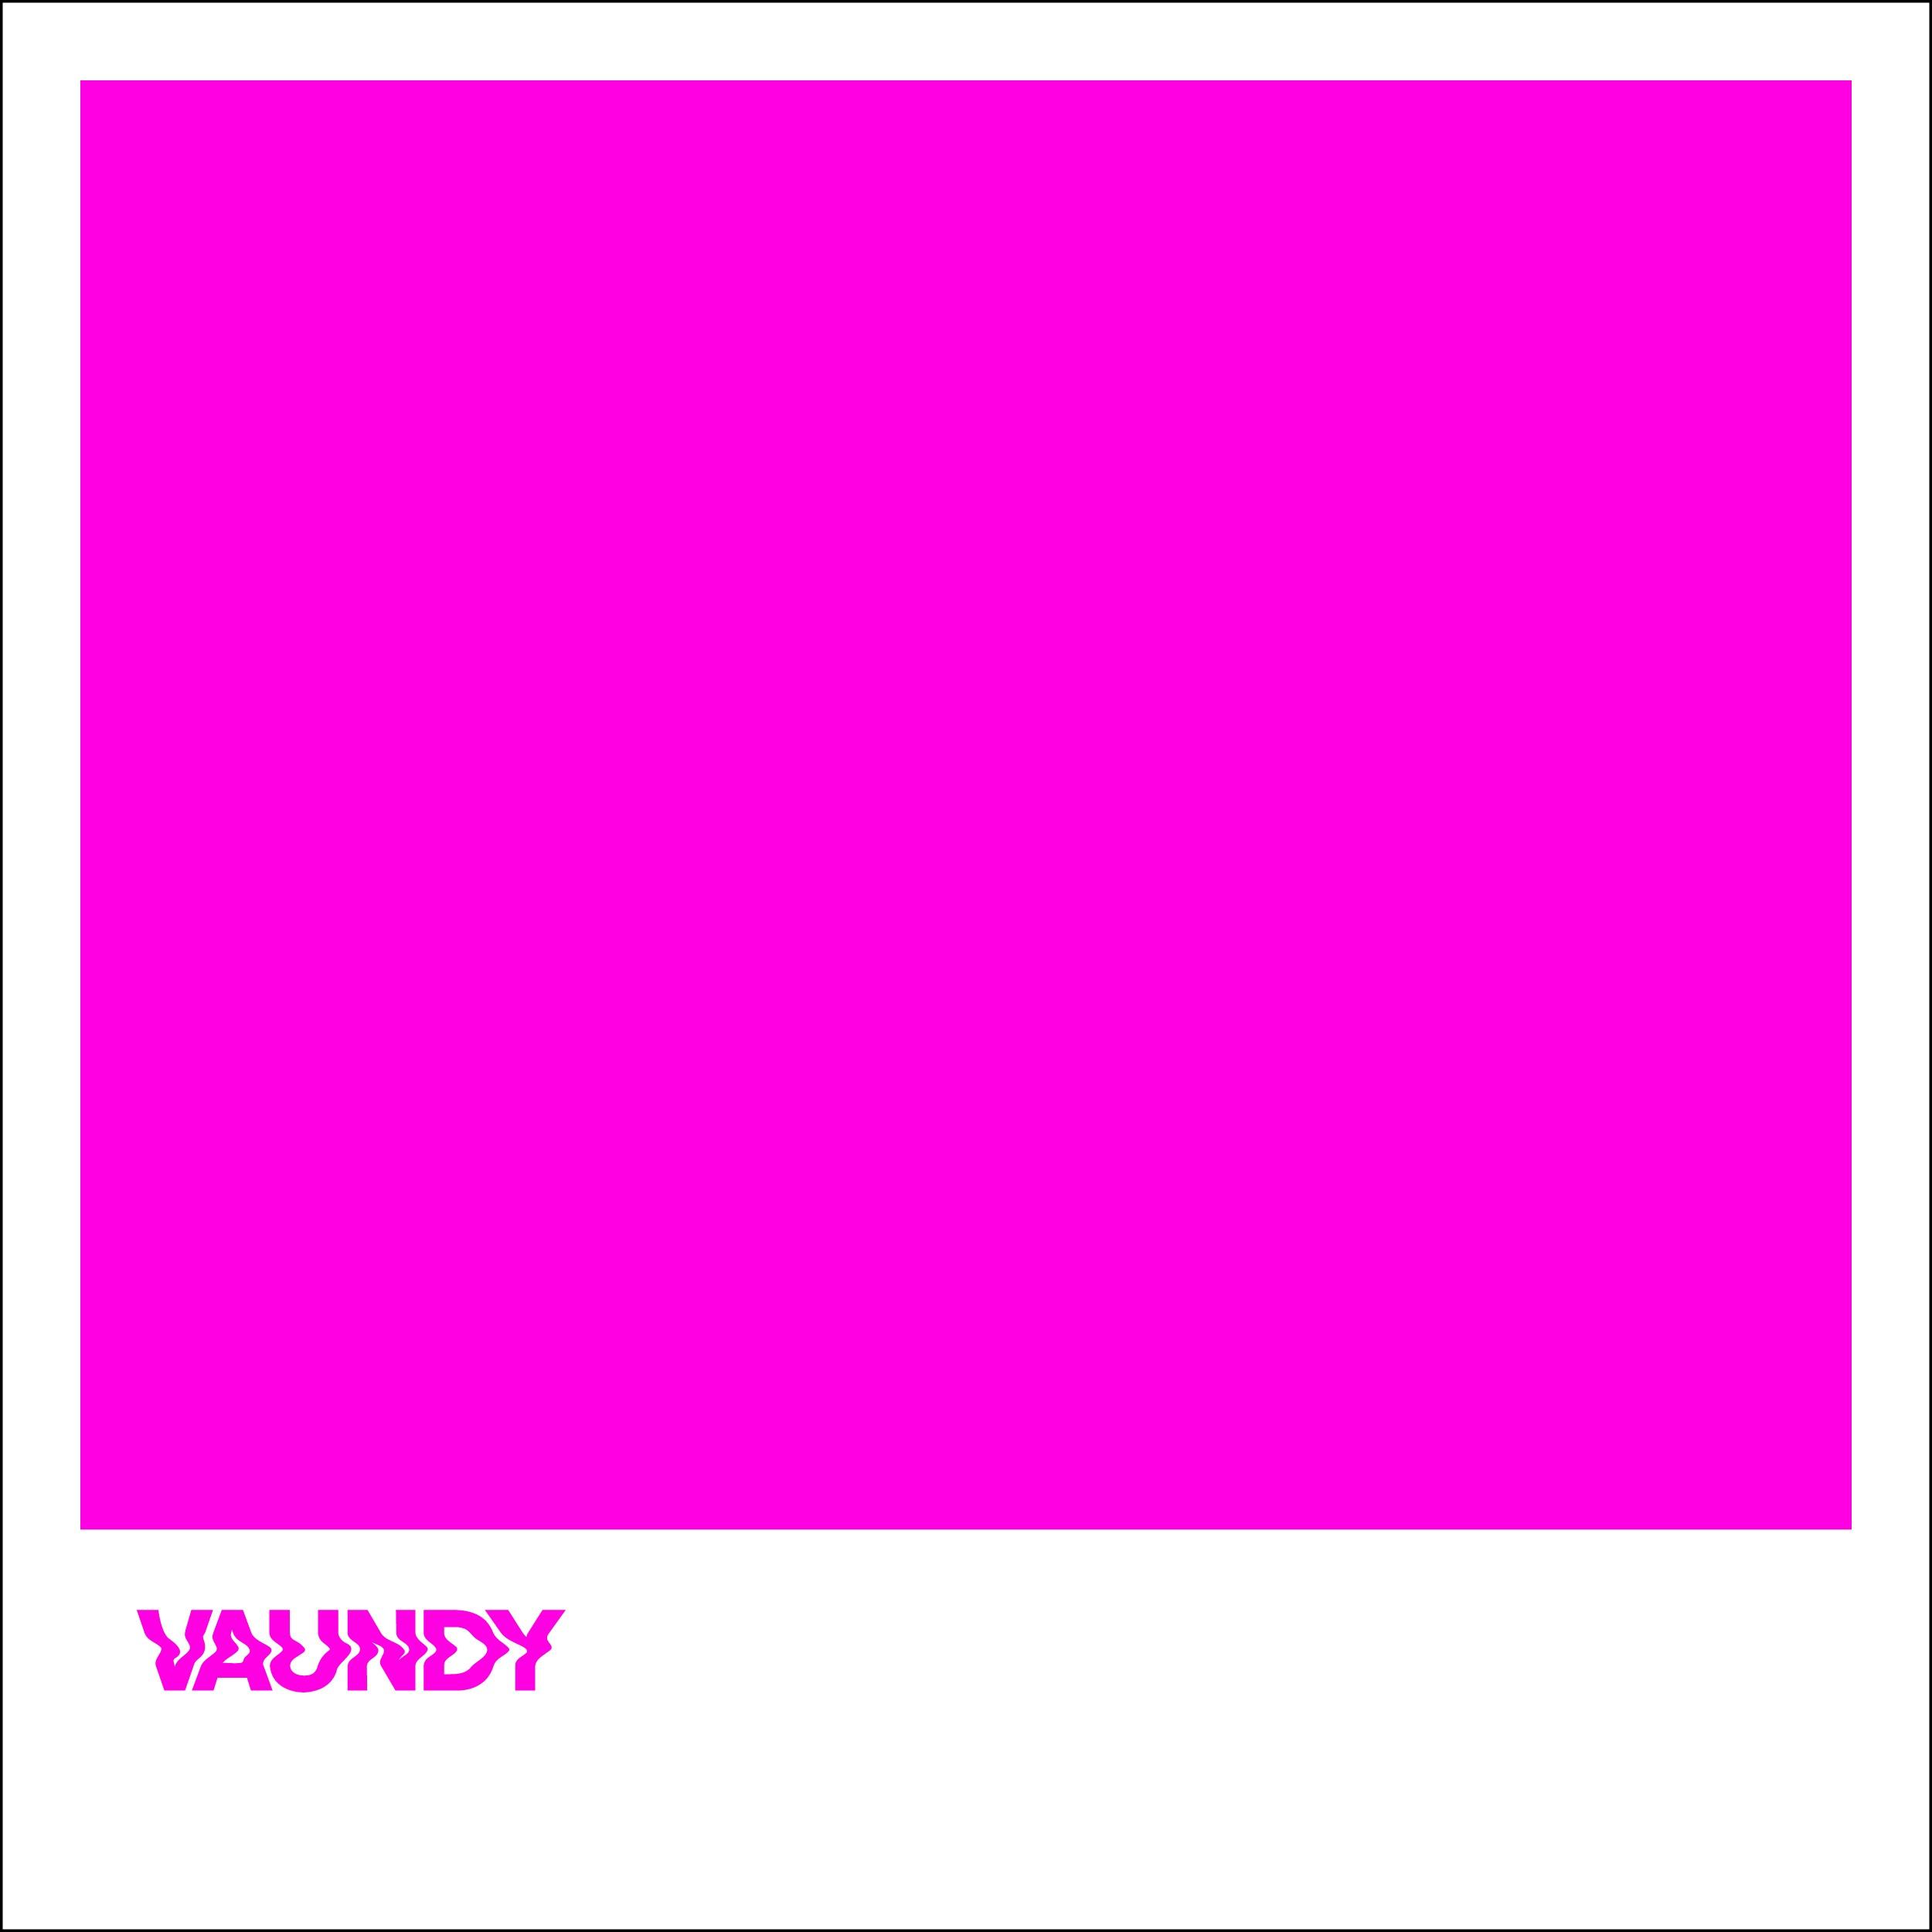 Image of strobo / Vaundy